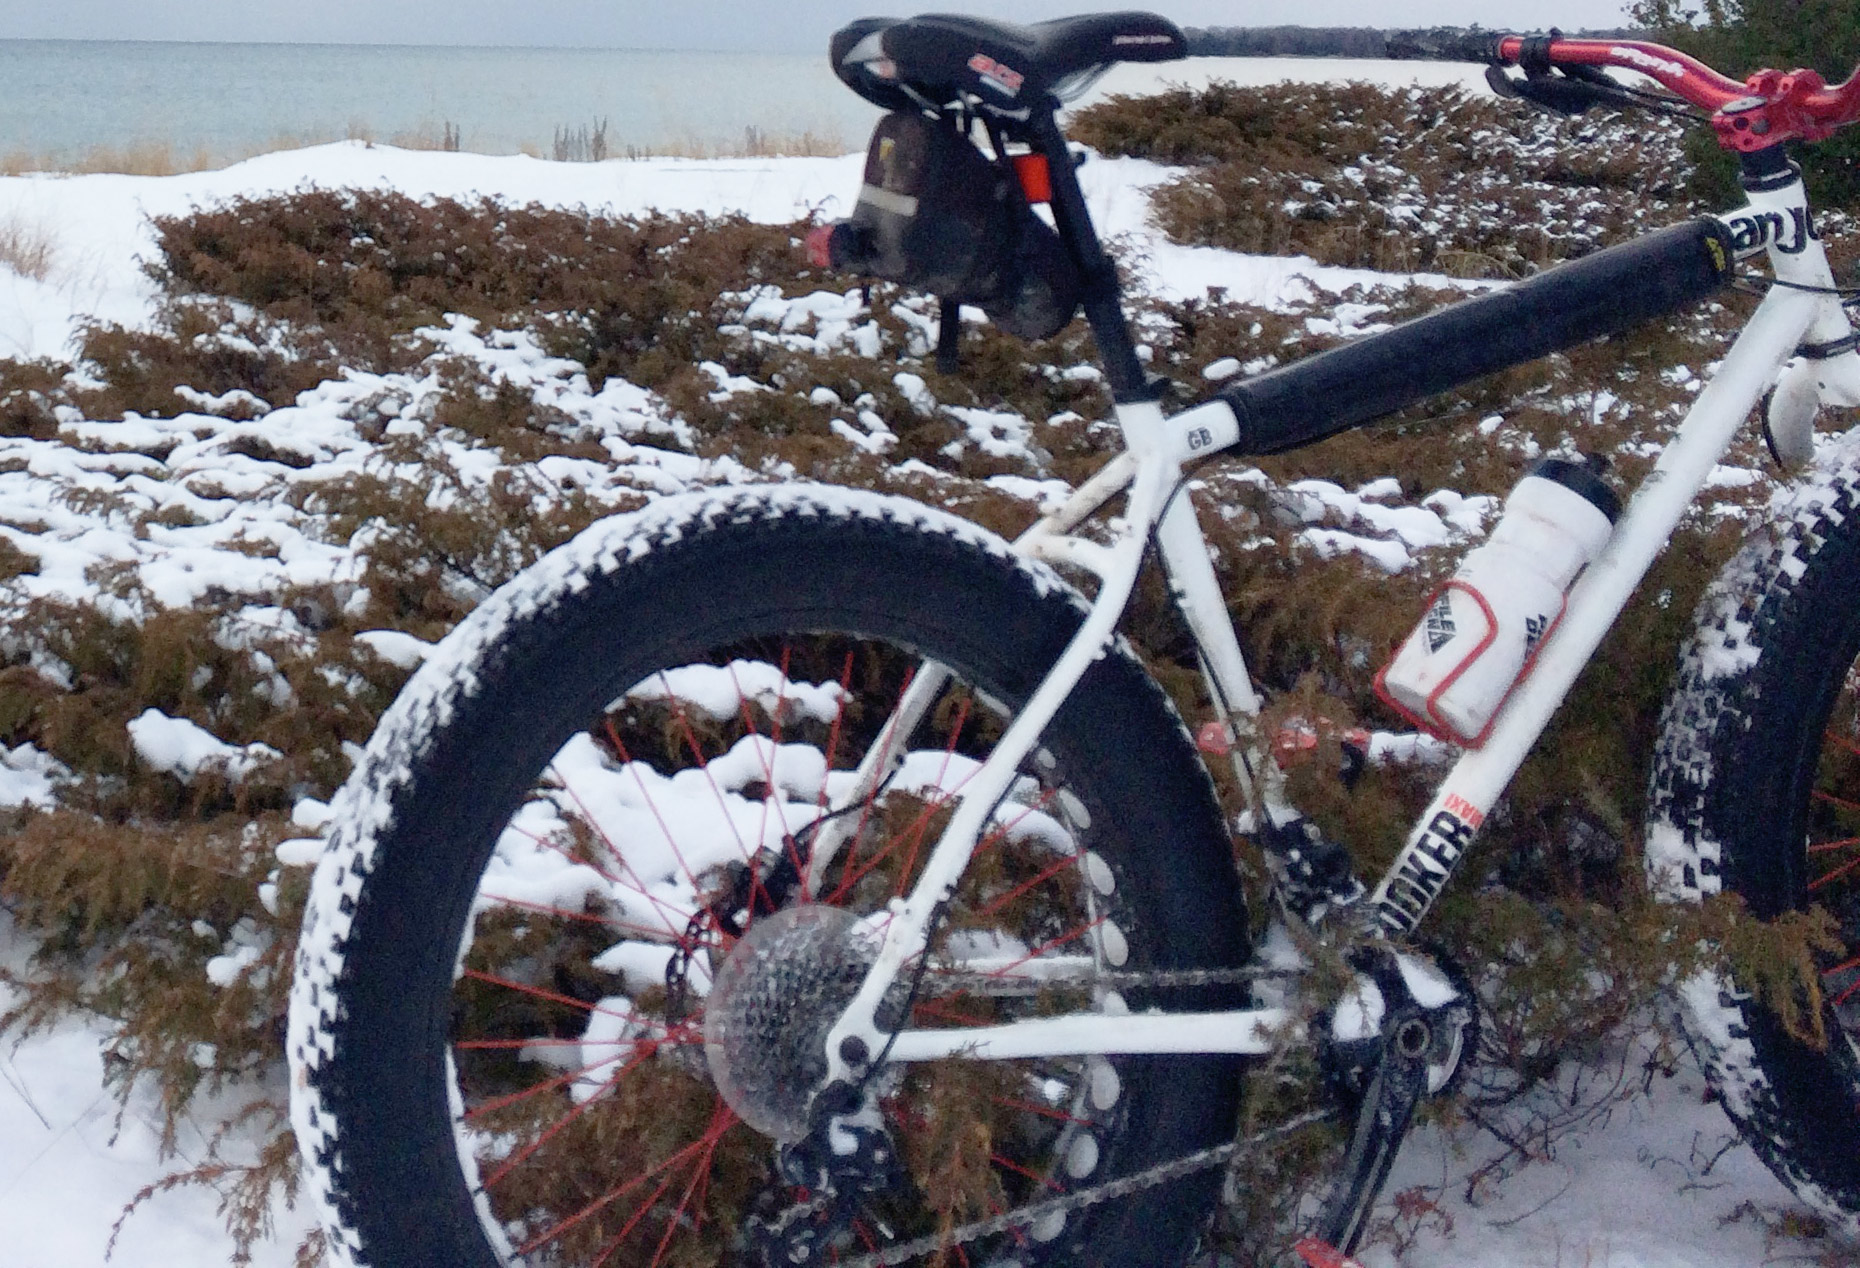 biking-background4.jpg